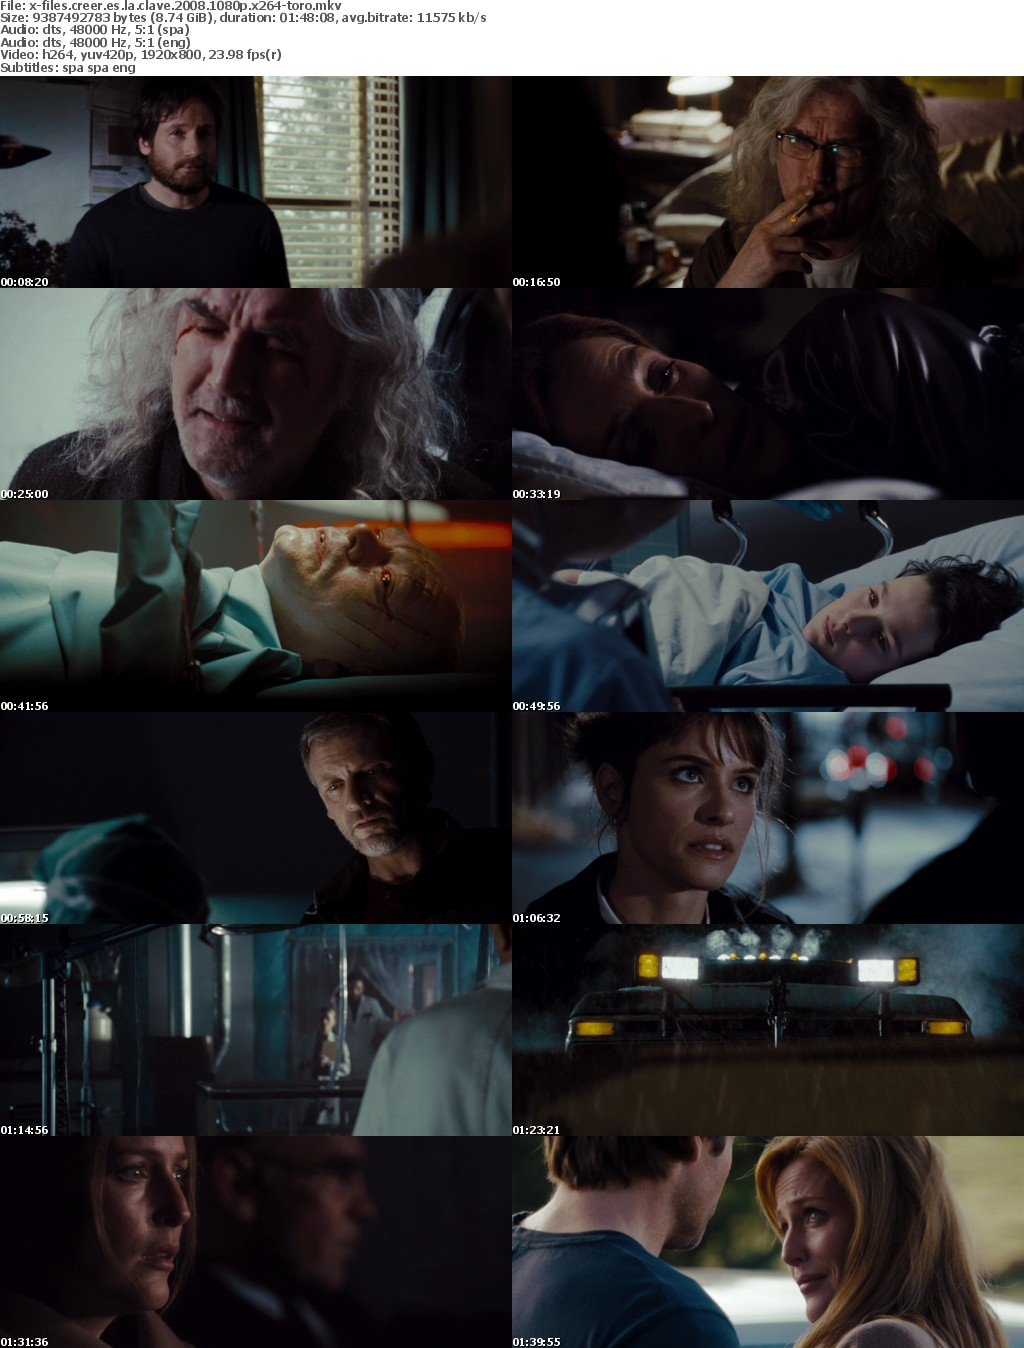 X-Files Creer Es La Clave 2008 SPANiSH MULTi 1080p BluRay x264-TORO